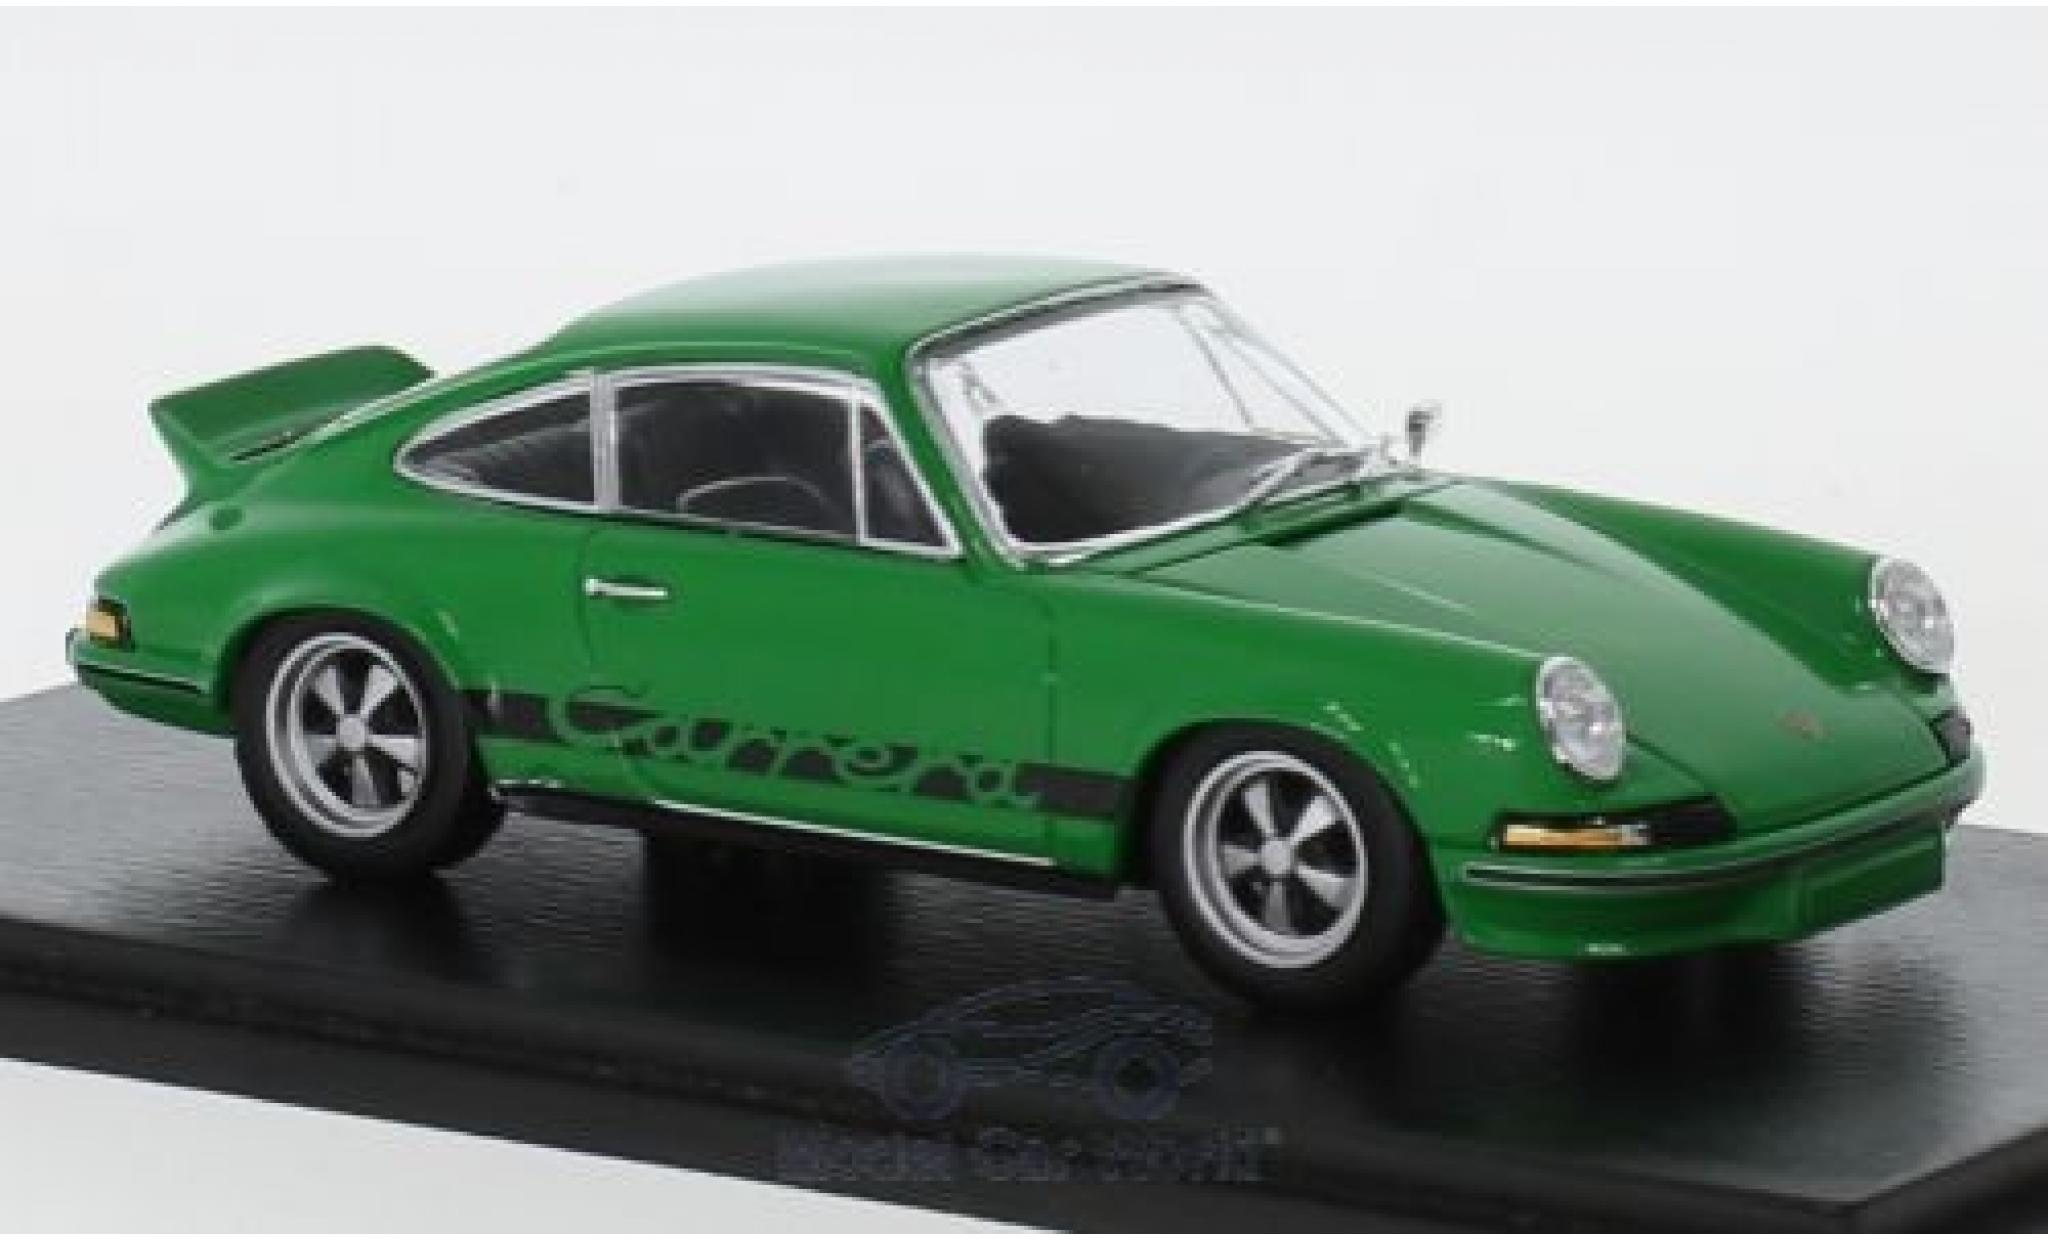 Porsche 911 RS 1/43 Spark Carrera 2.7 green 1973